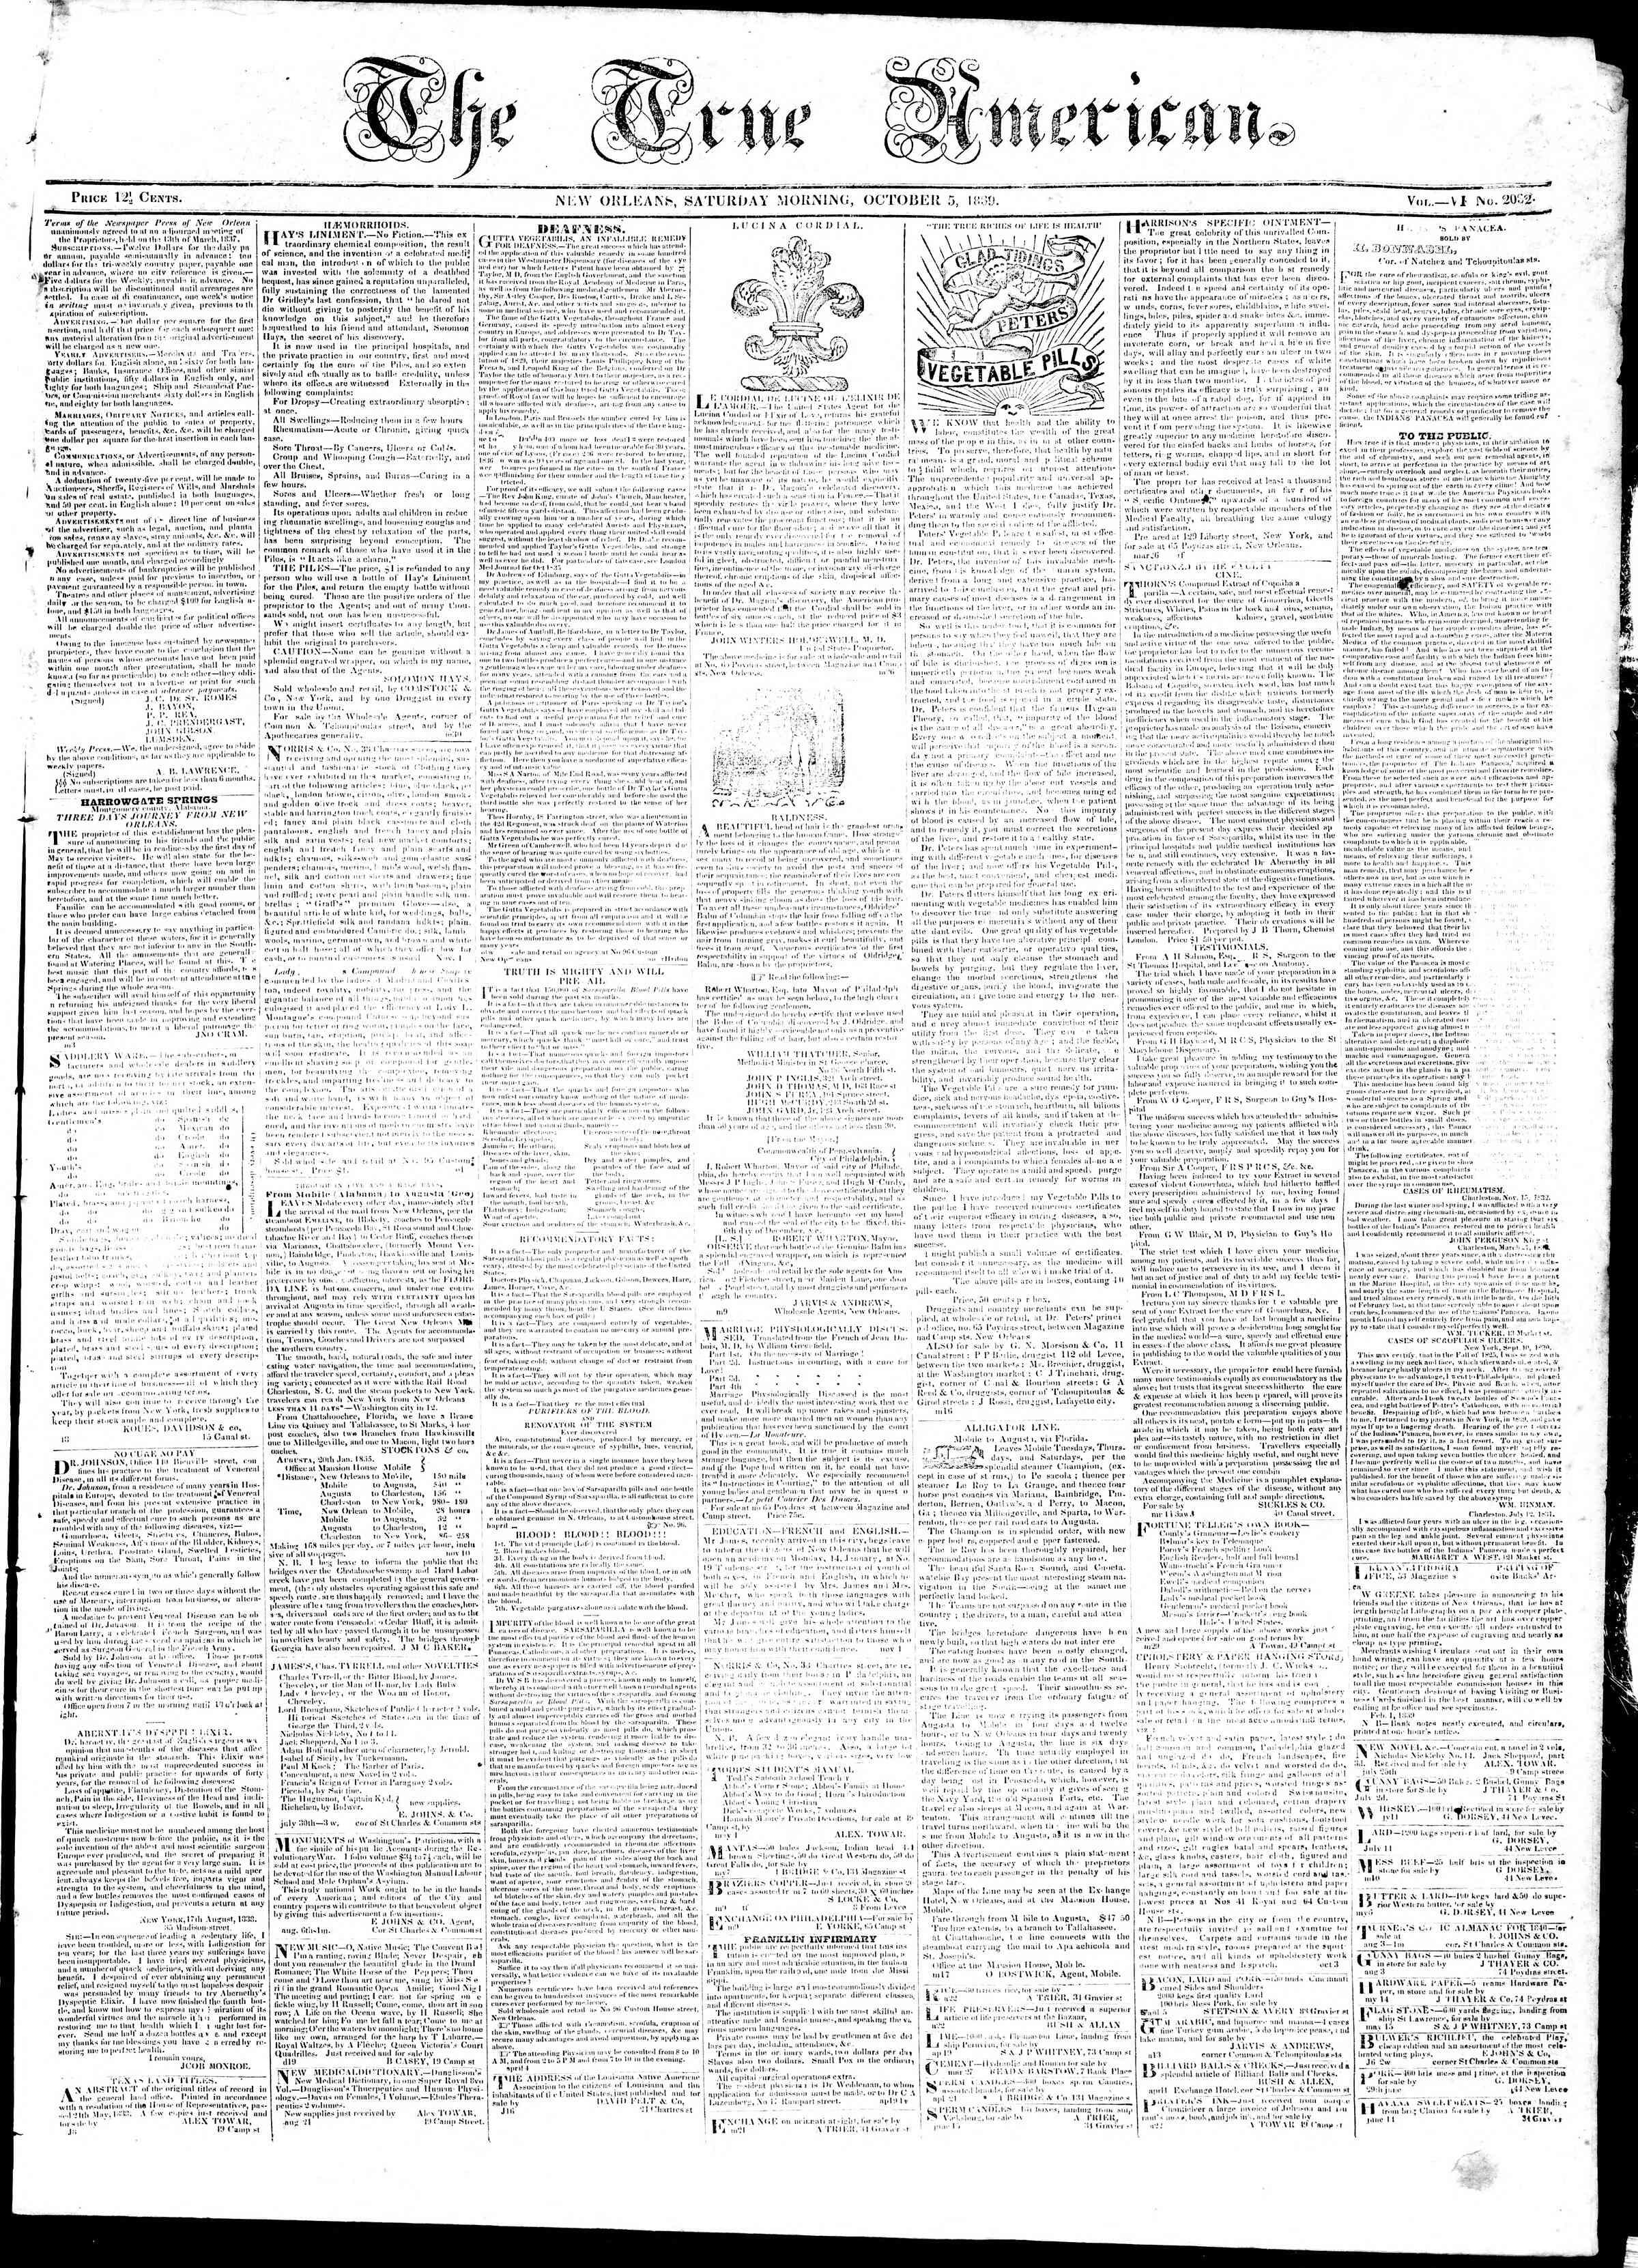 October 5, 1839 Tarihli True American Gazetesi Sayfa 1